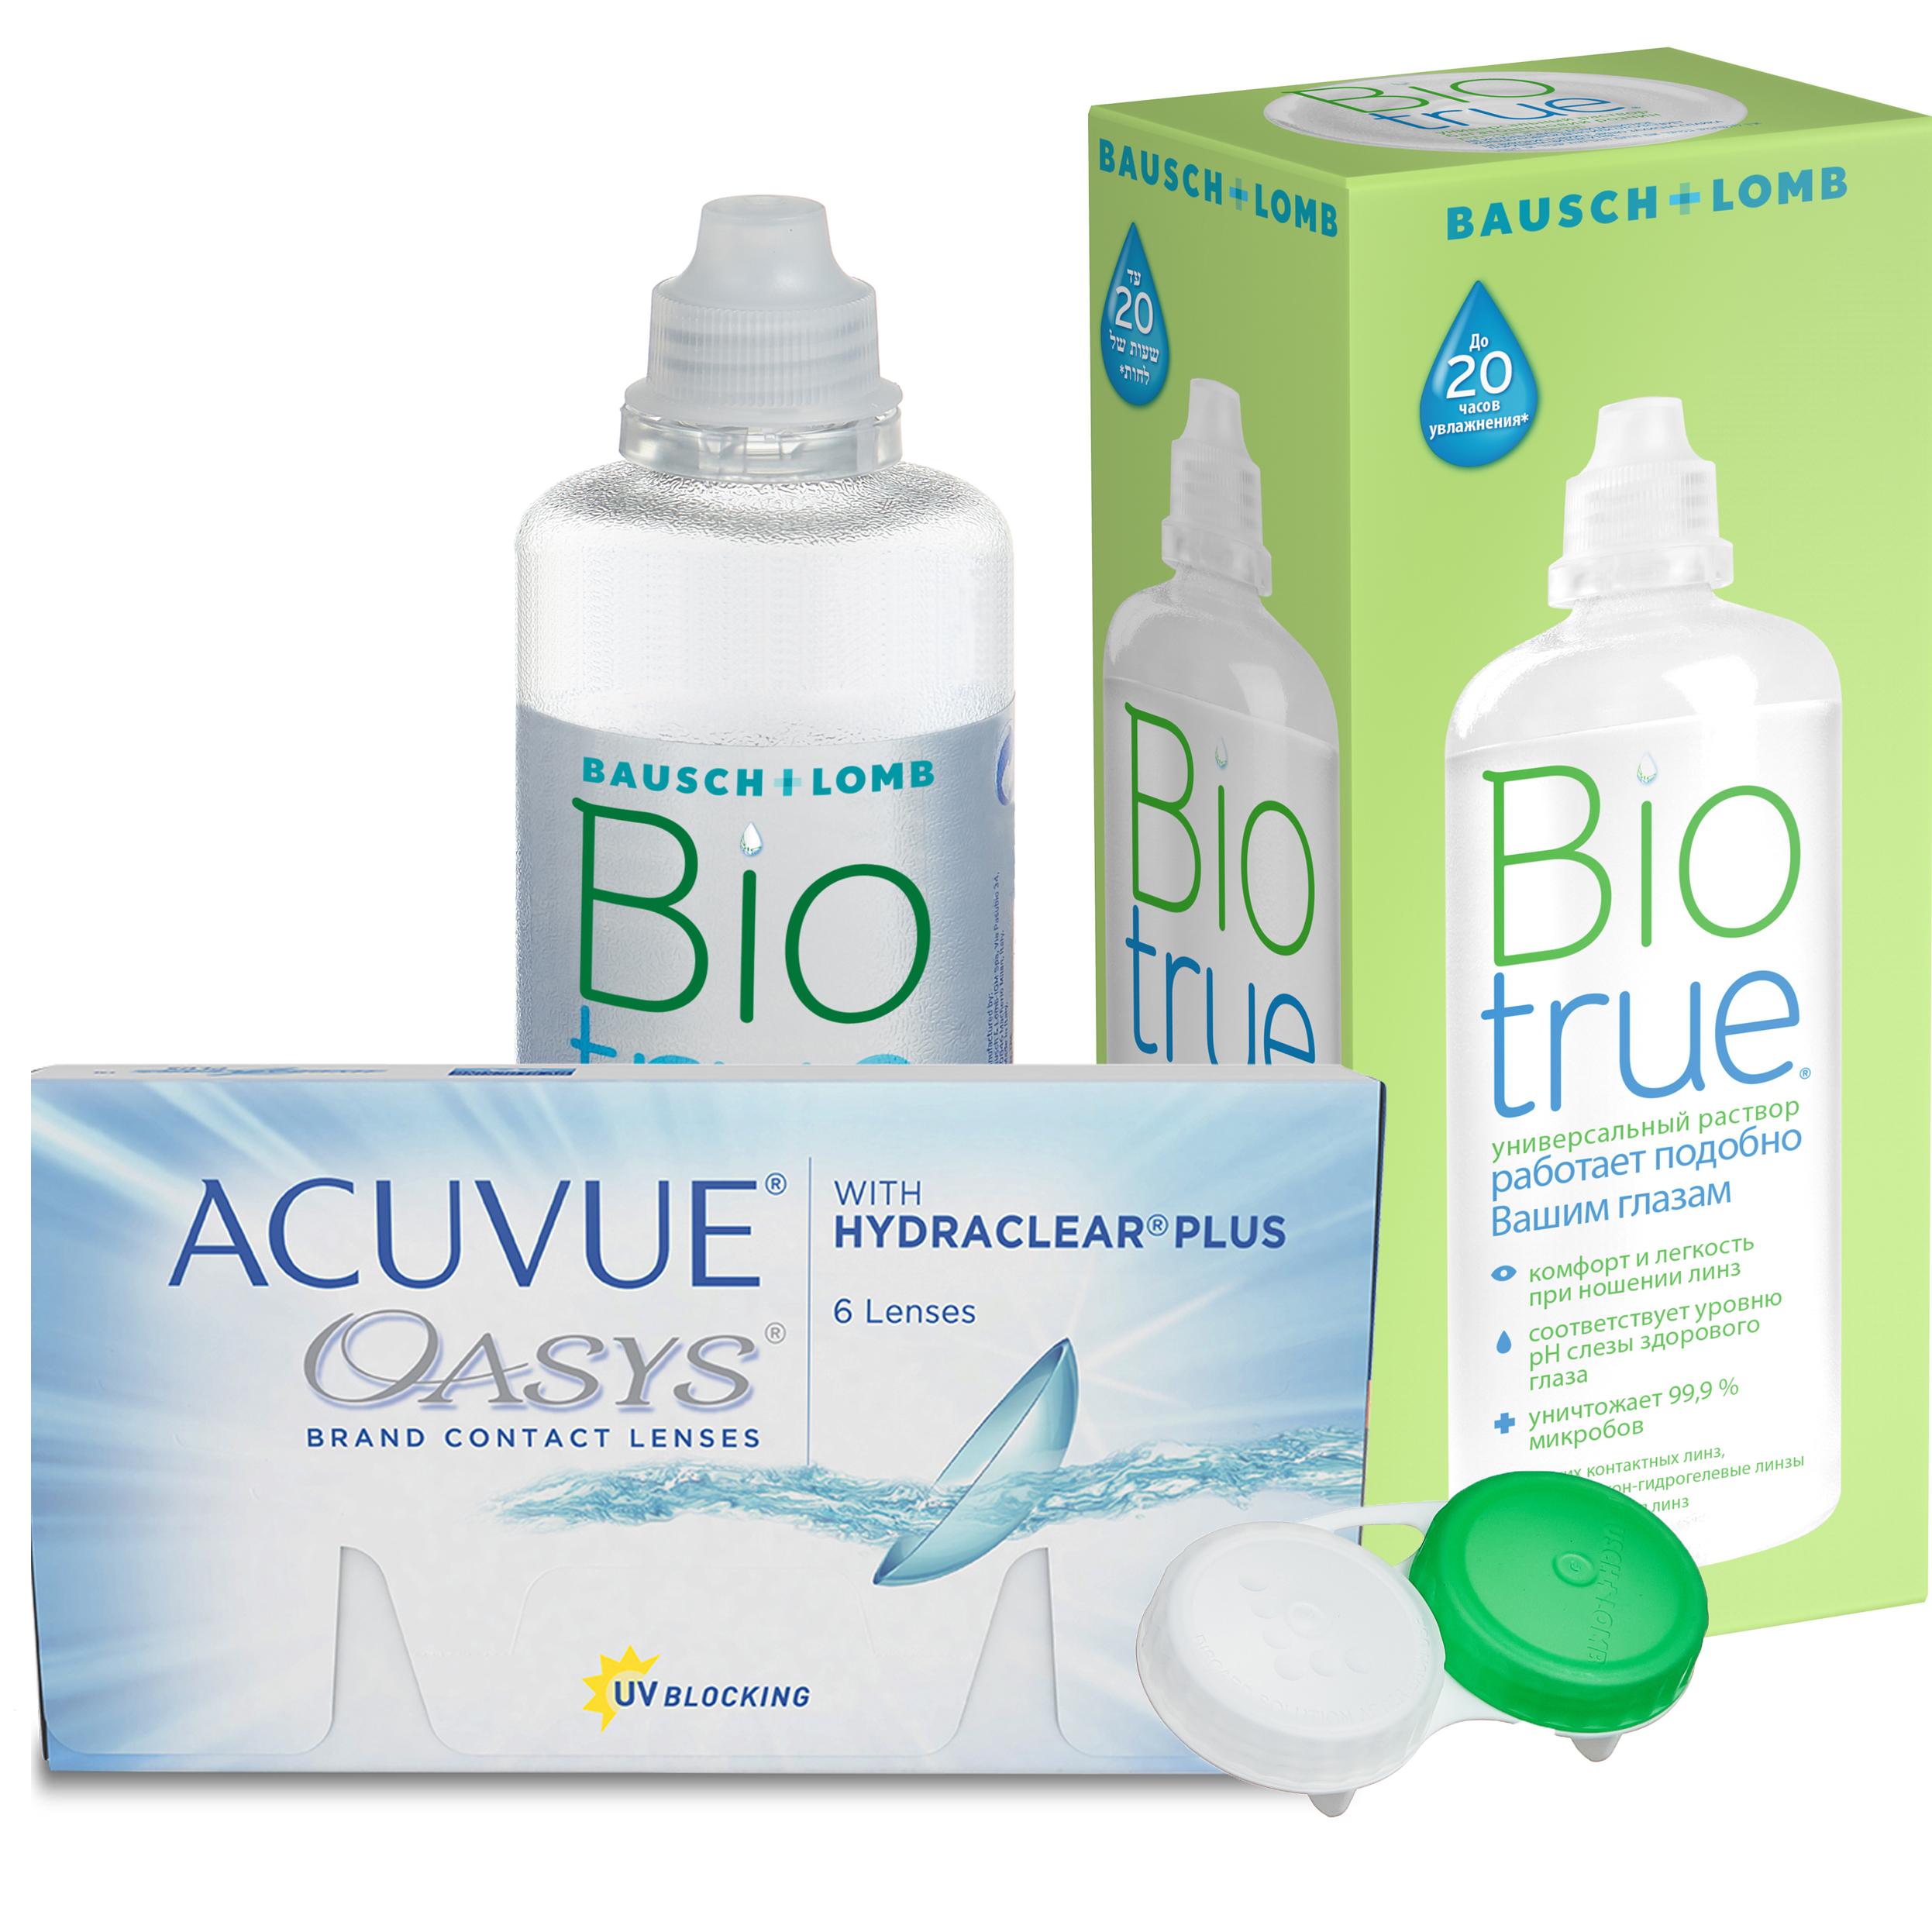 Купить Oasys with Hydraclear Plus 6 линз + Biotrue, Контактные линзы Acuvue Oasys with Hydraclear Plus 6 линз R 8.8 +7, 50 + Biotrue 300 мл